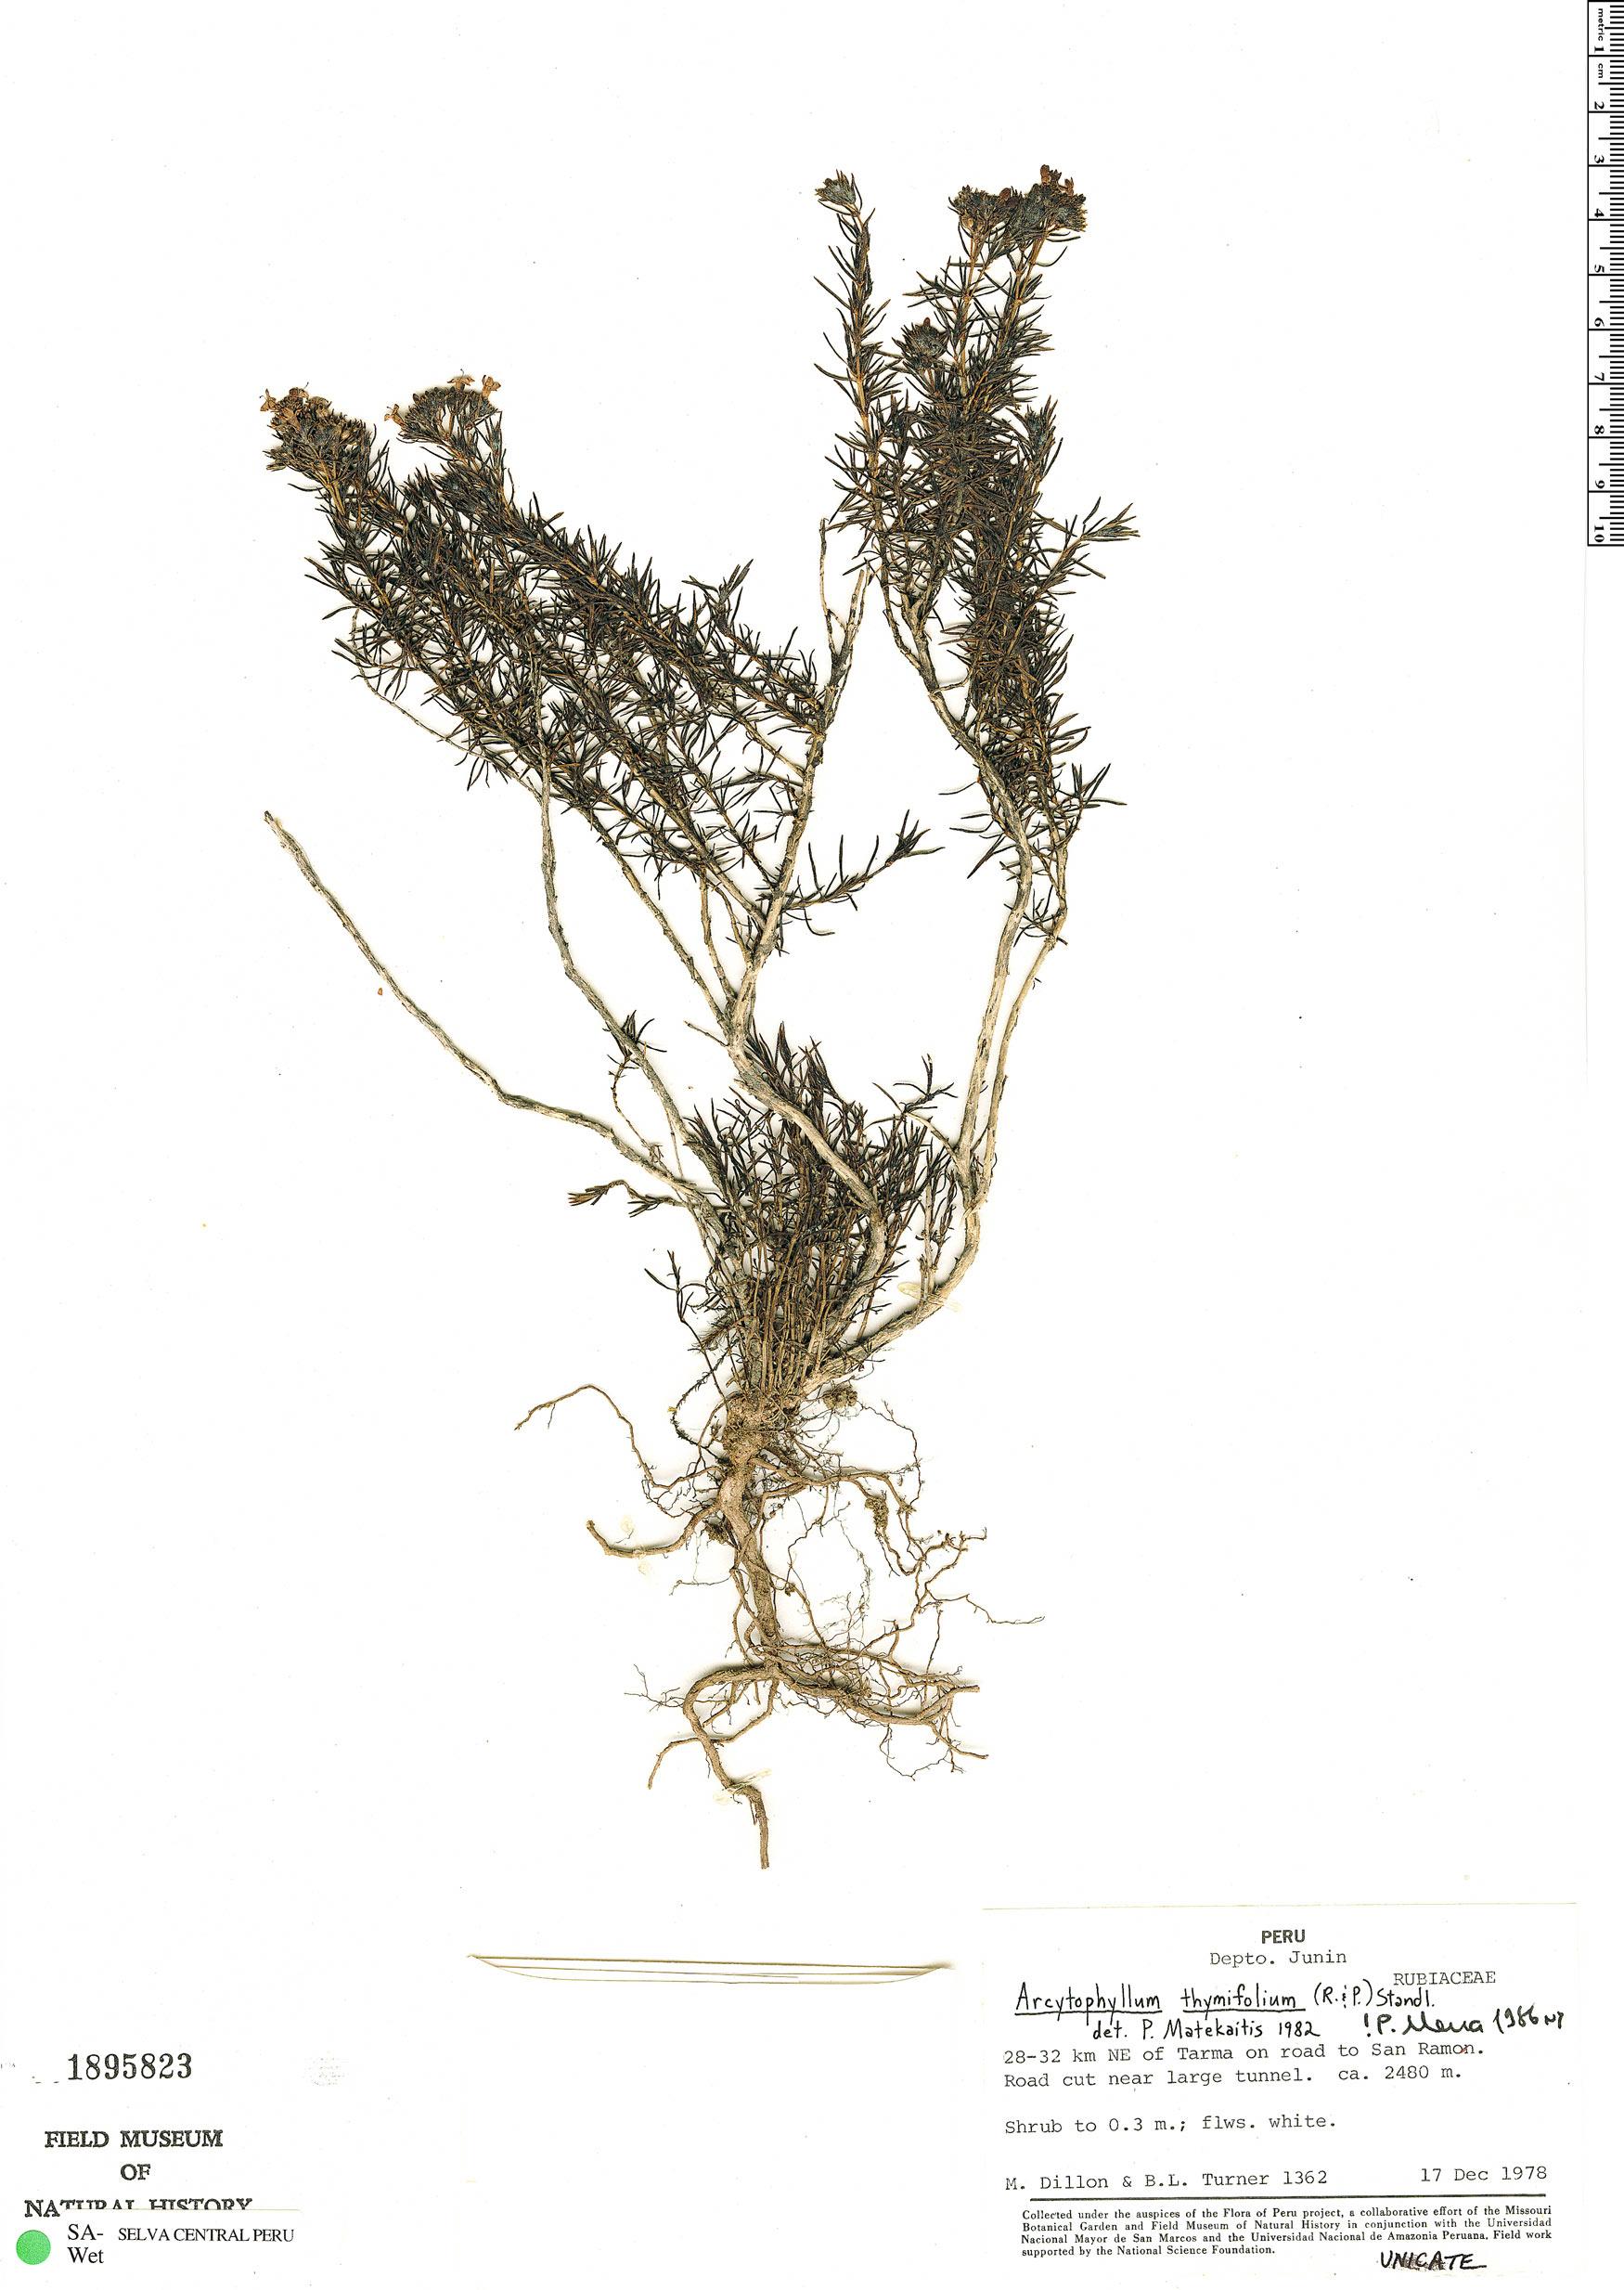 Specimen: Arcytophyllum thymifolium